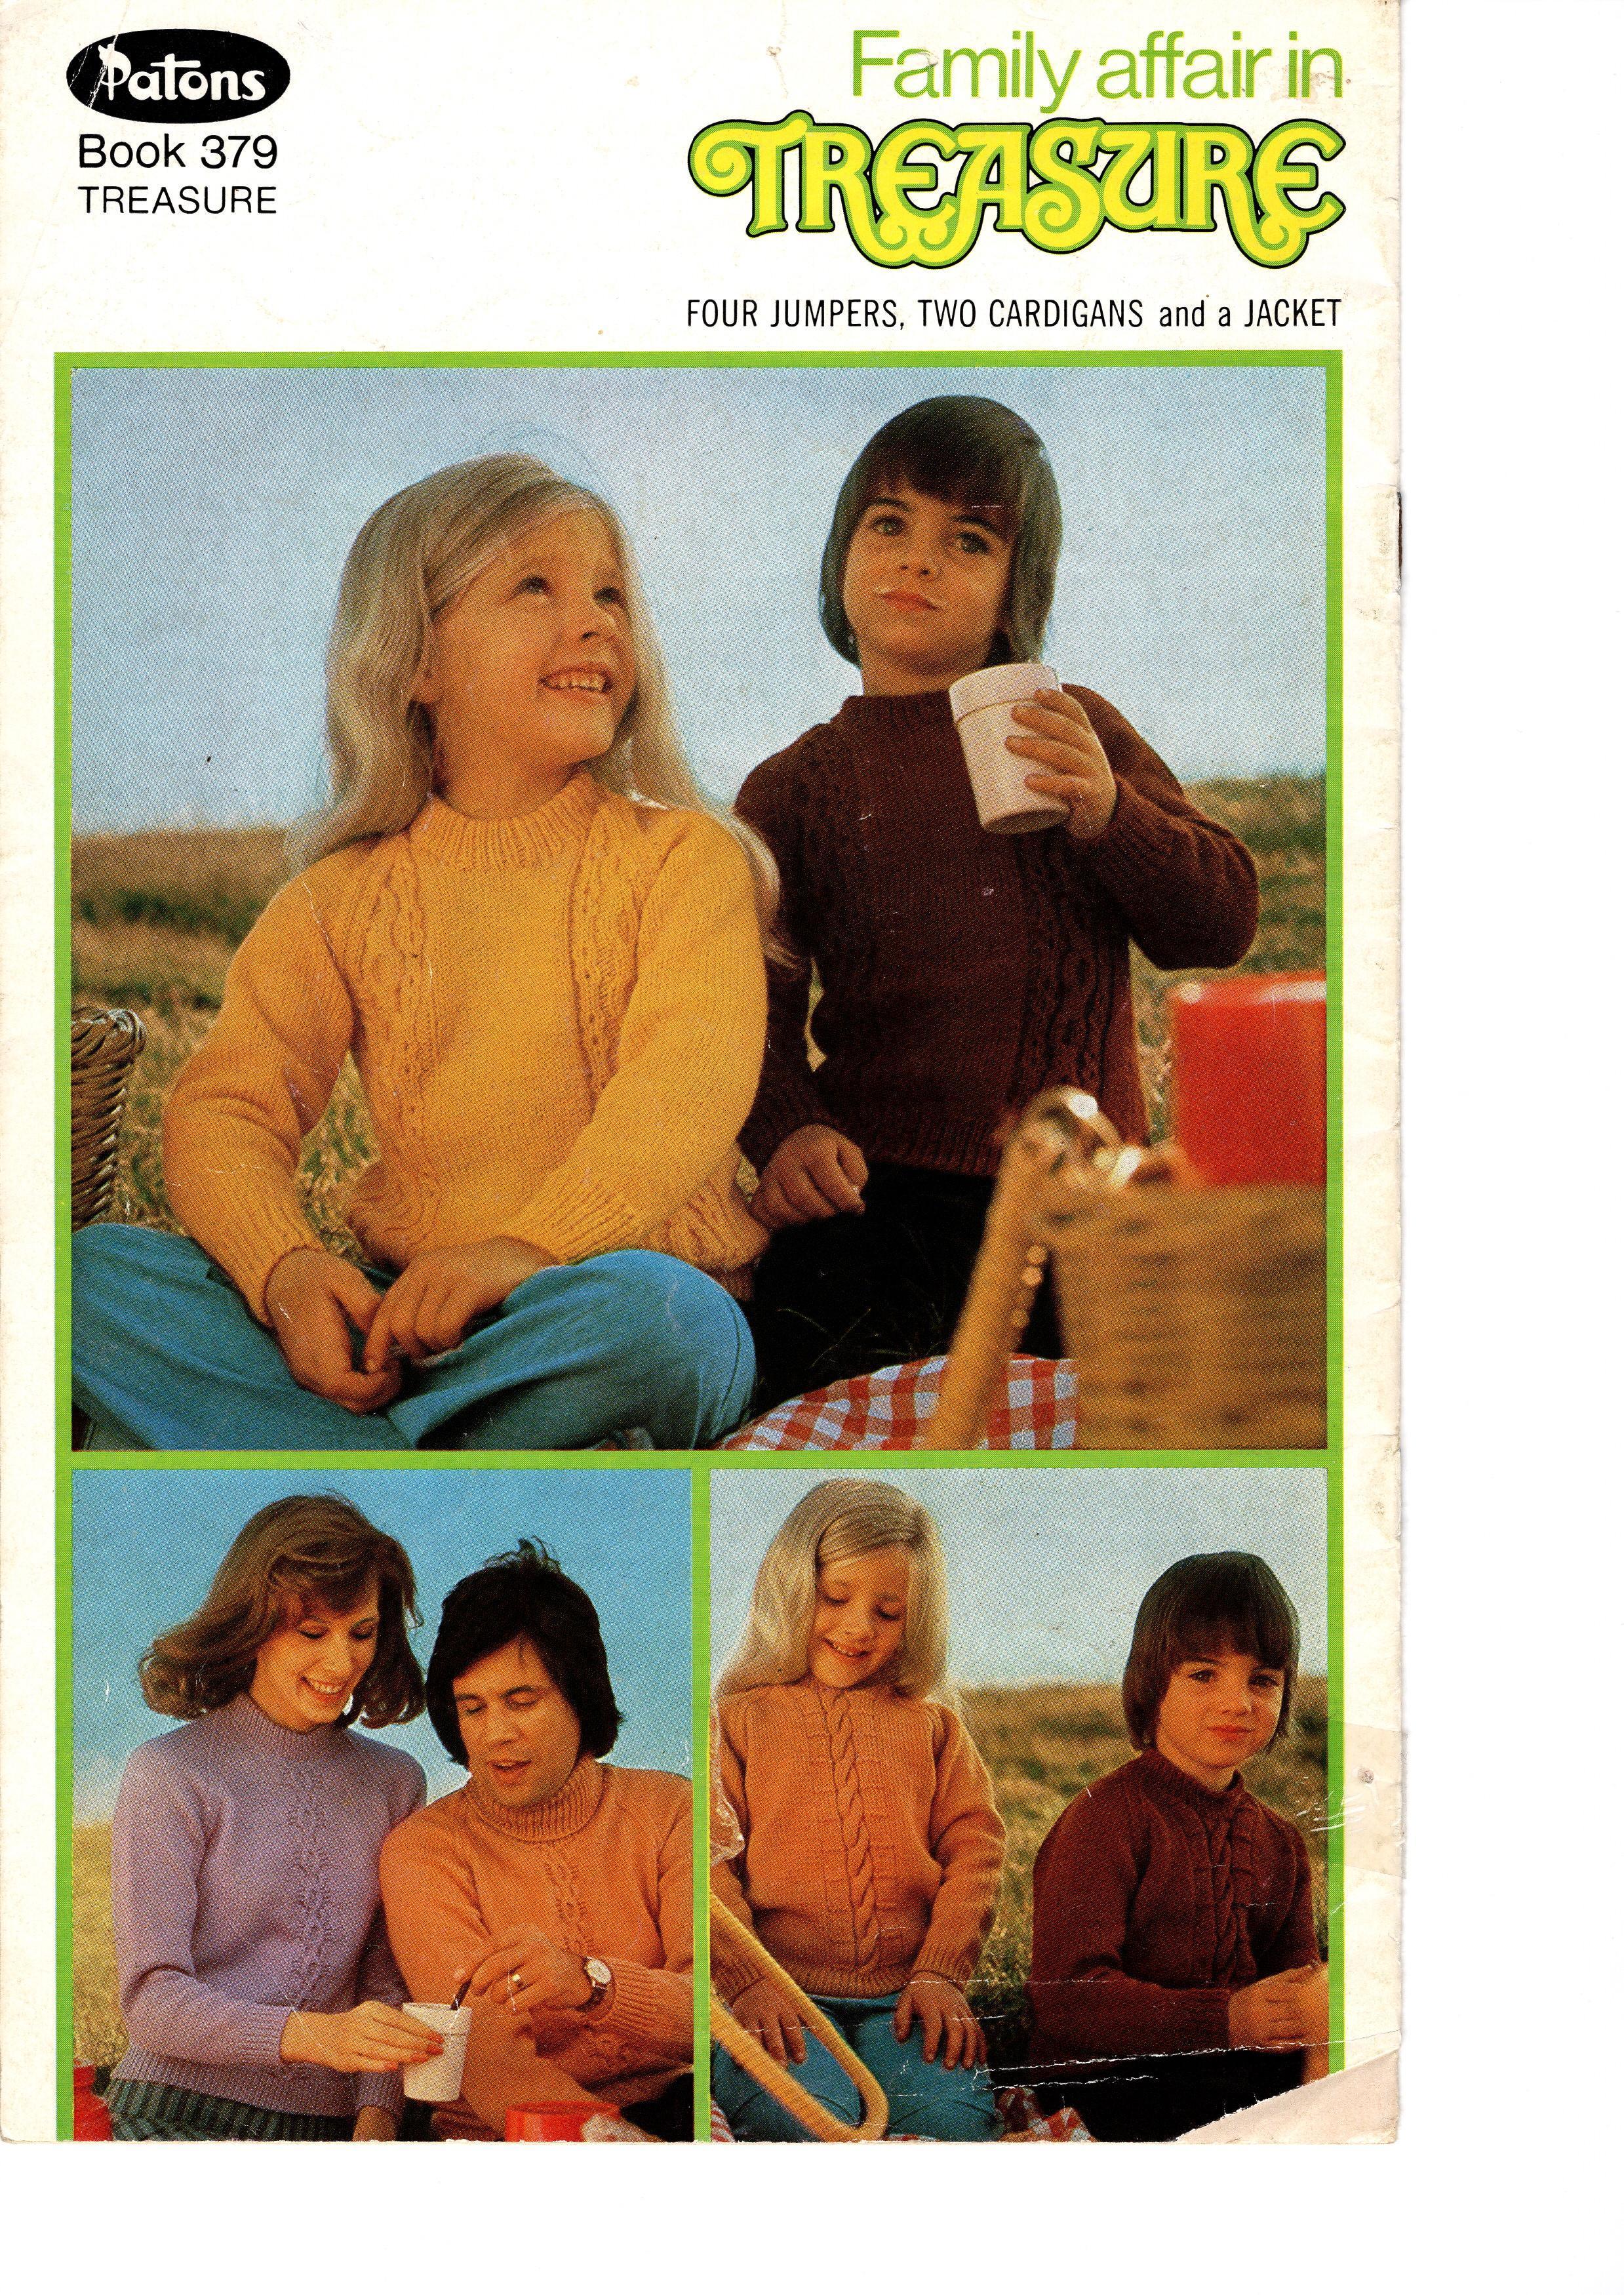 Patons Treasure Knitting Pattern Booklet No.379 00032